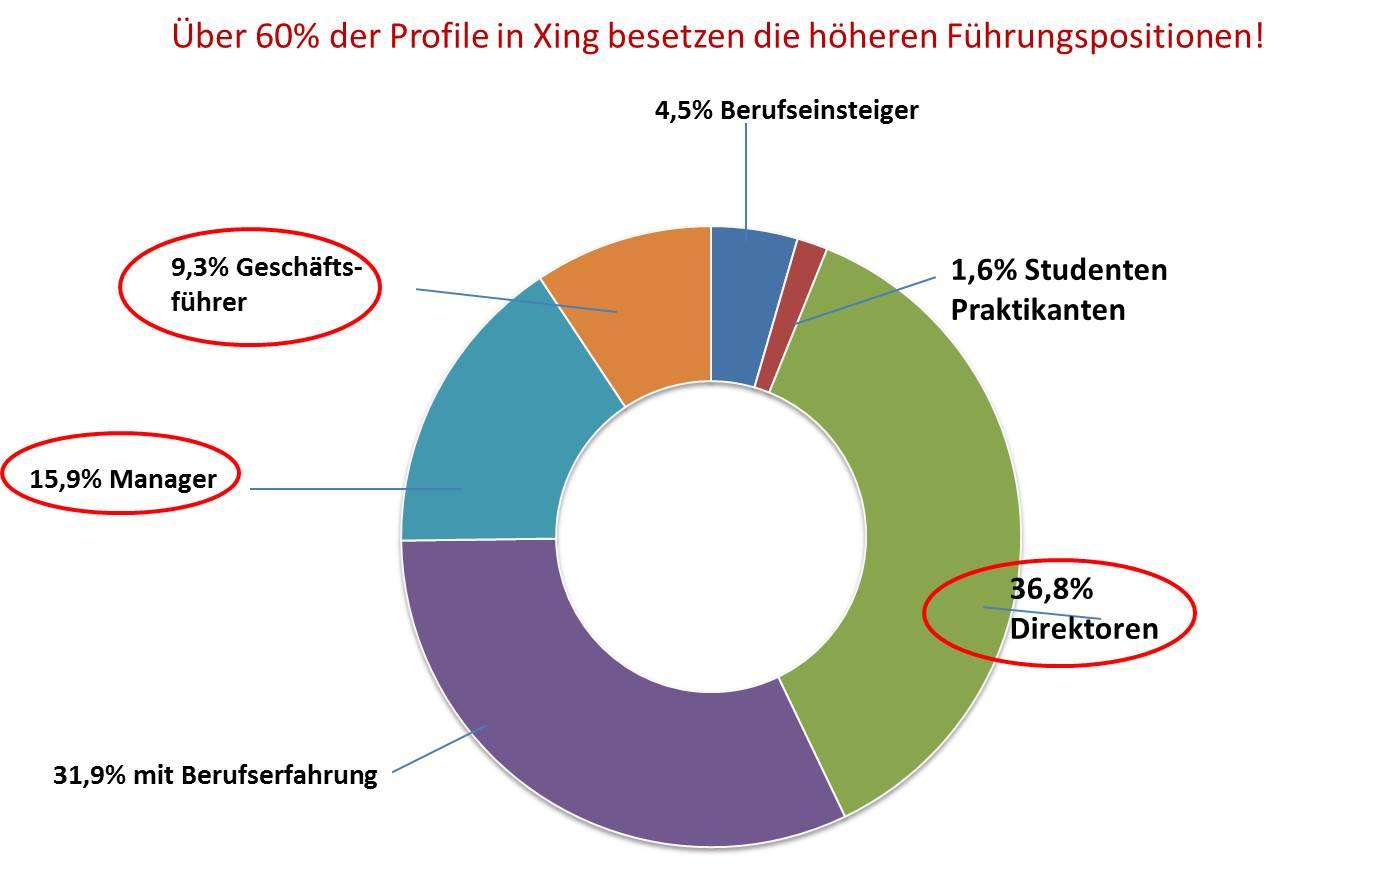 Führungspositionen Xing